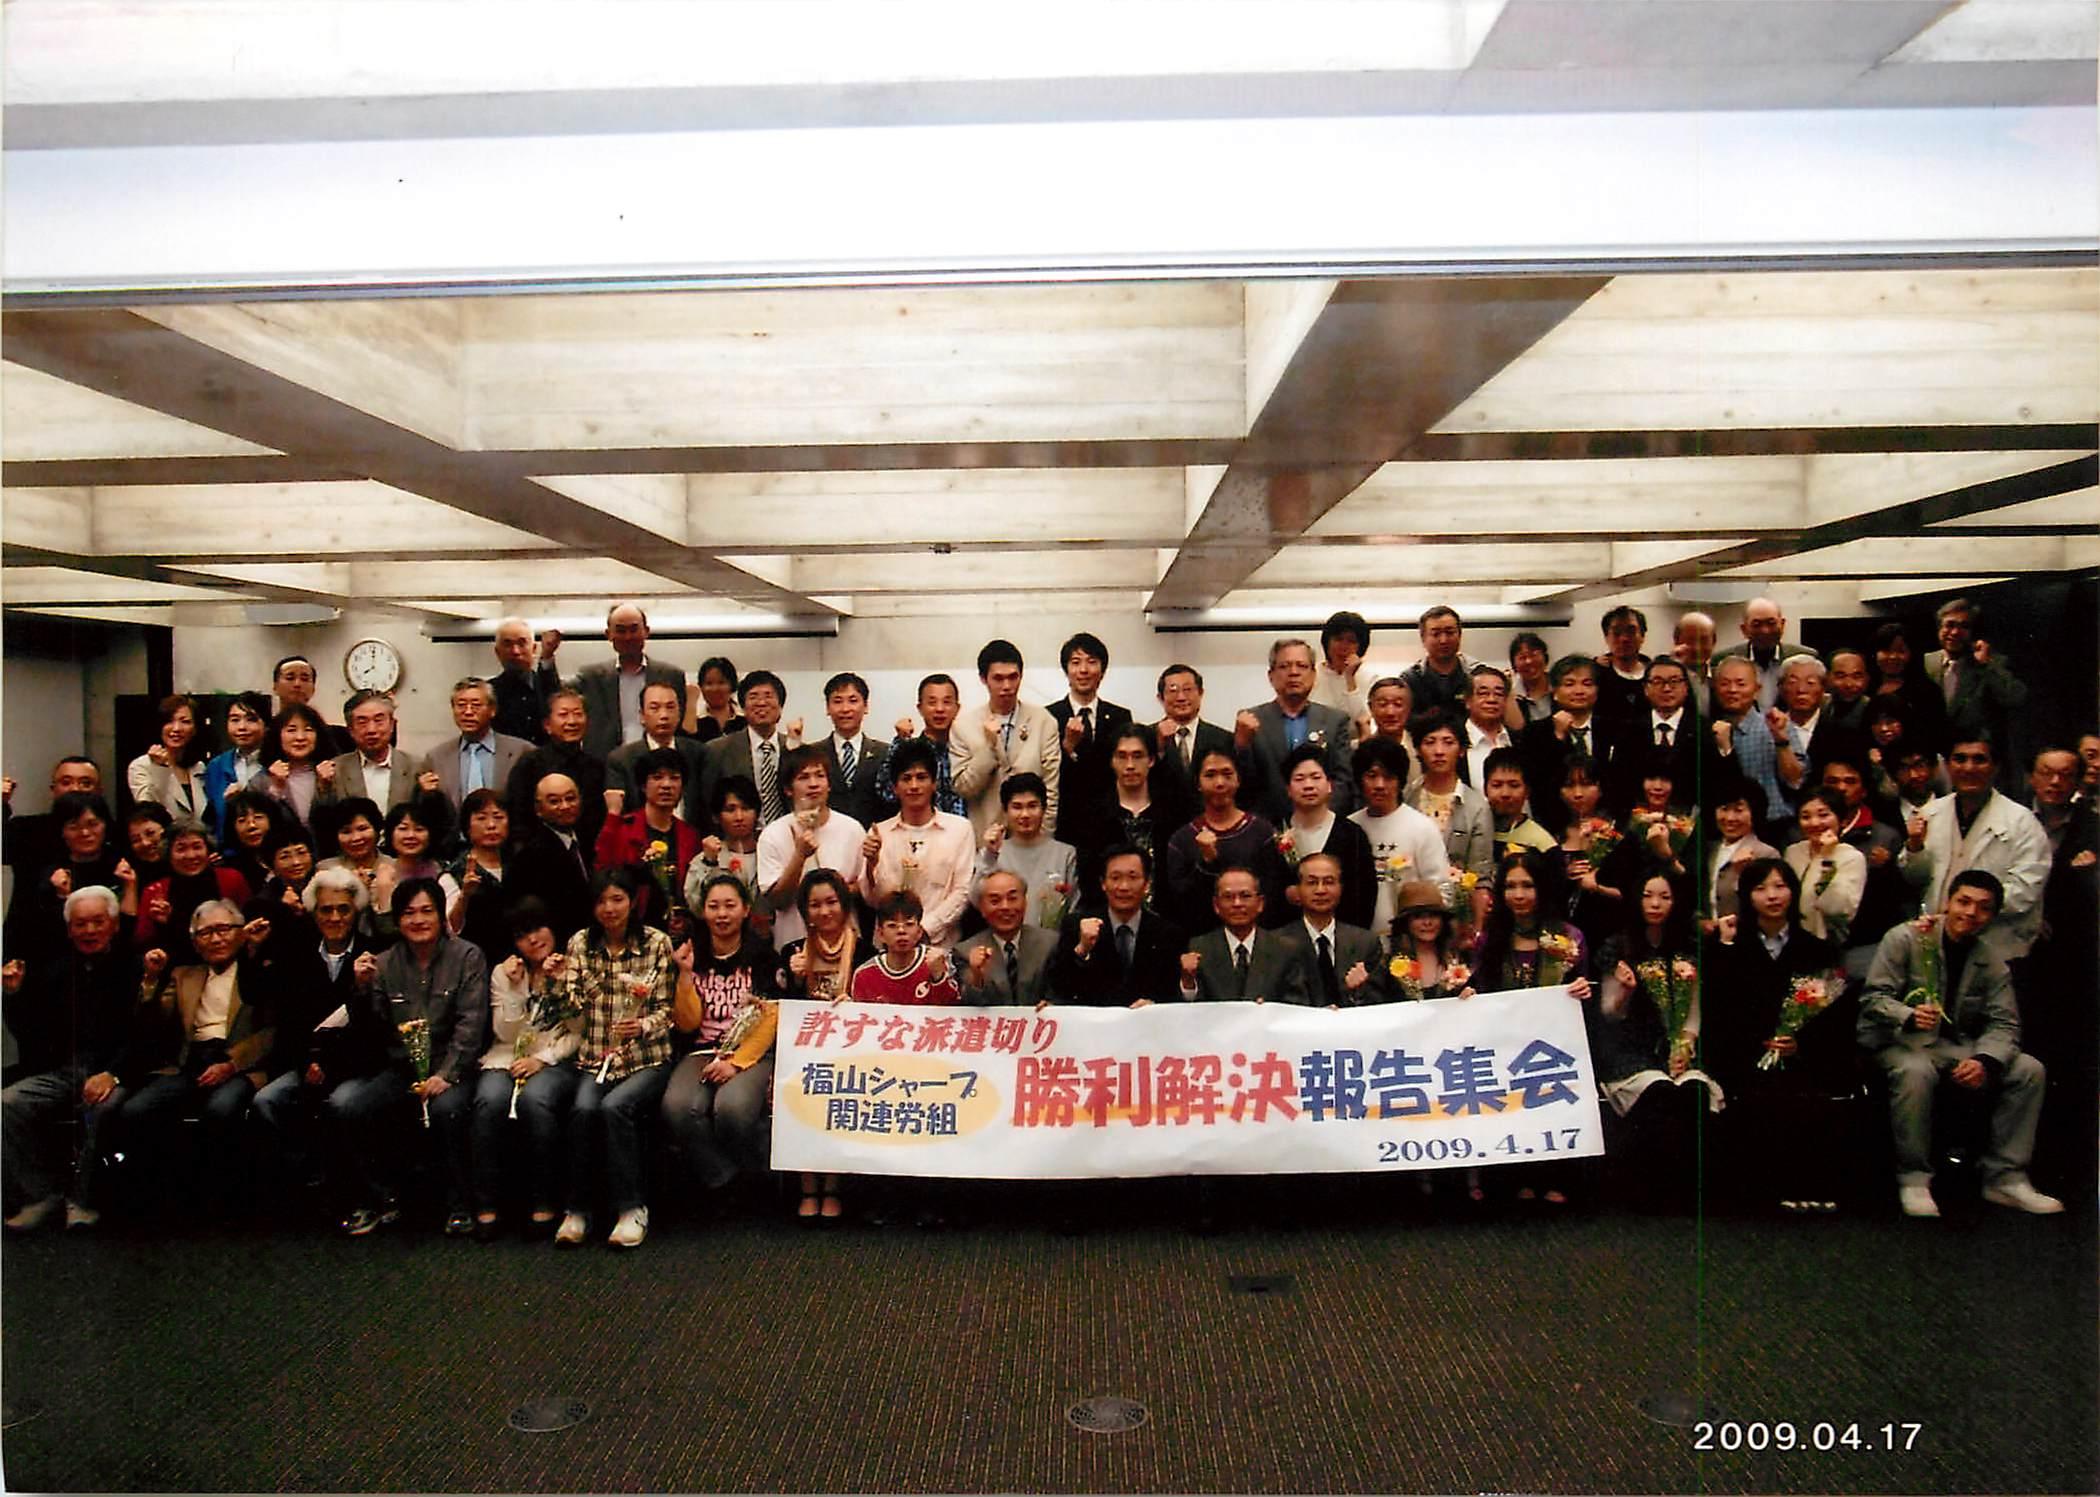 弁護士法人福山法律事務所ホームページ